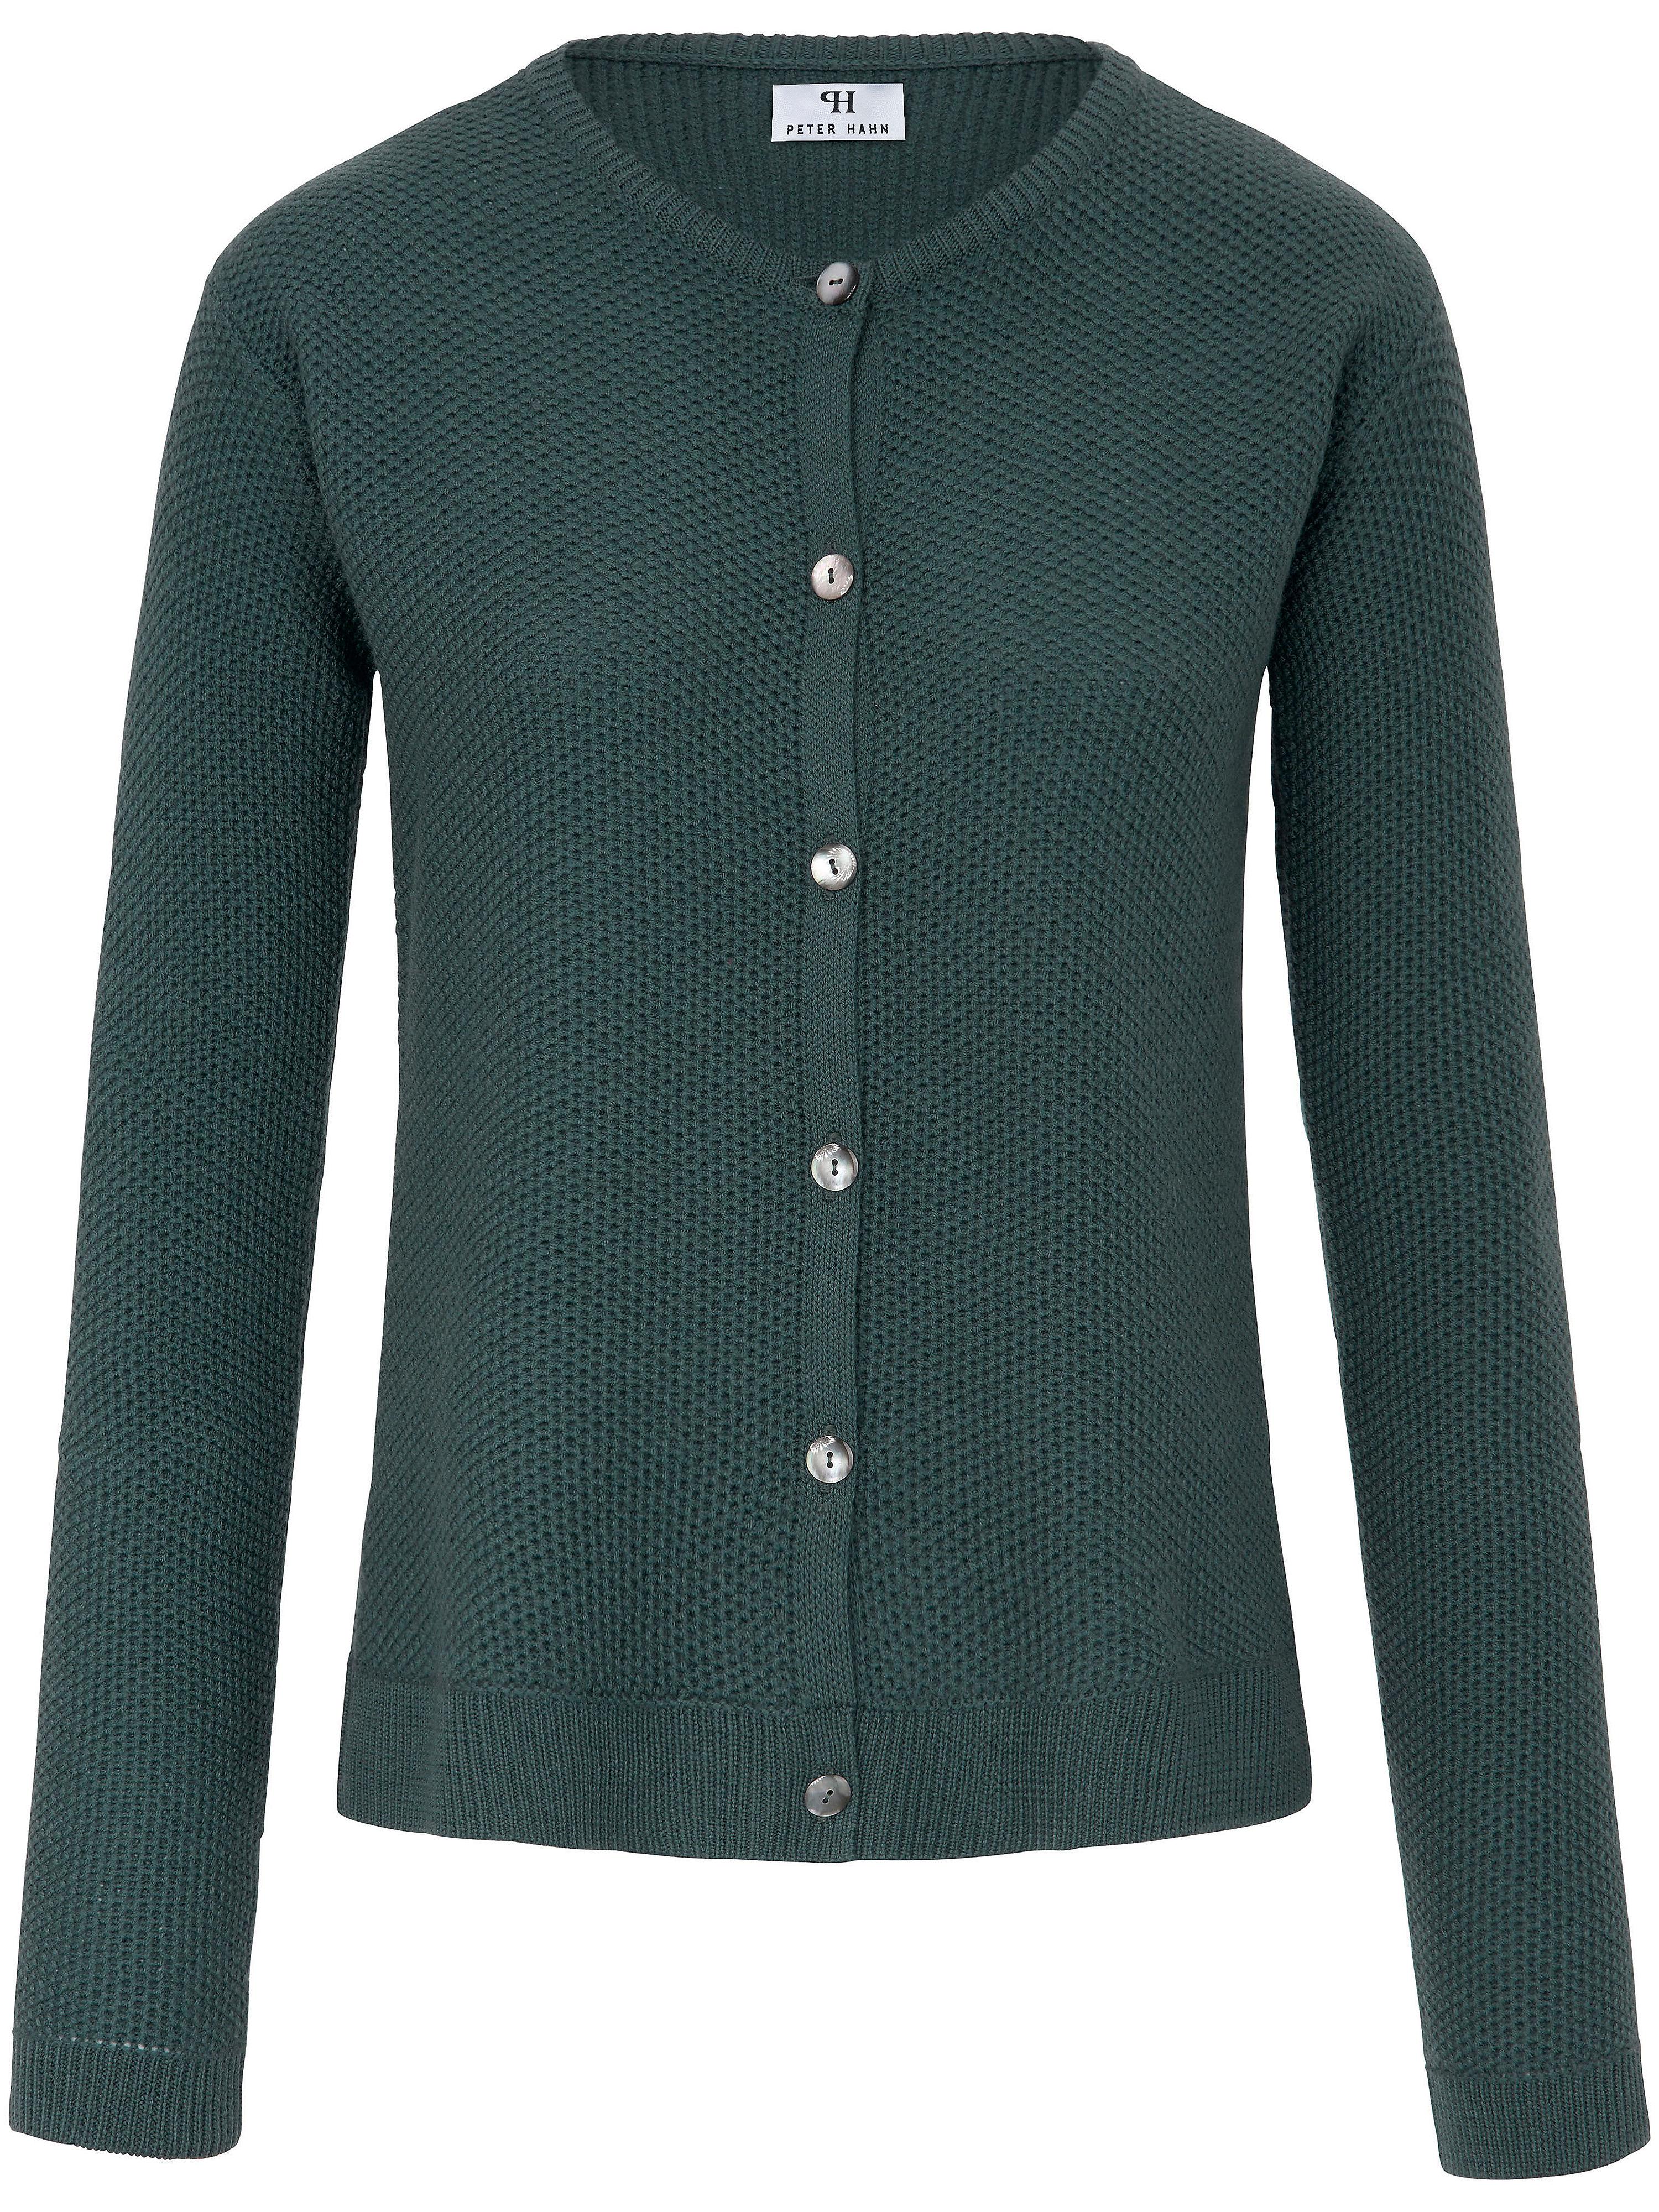 La veste 100% laine vierge  Peter Hahn vert taille 40